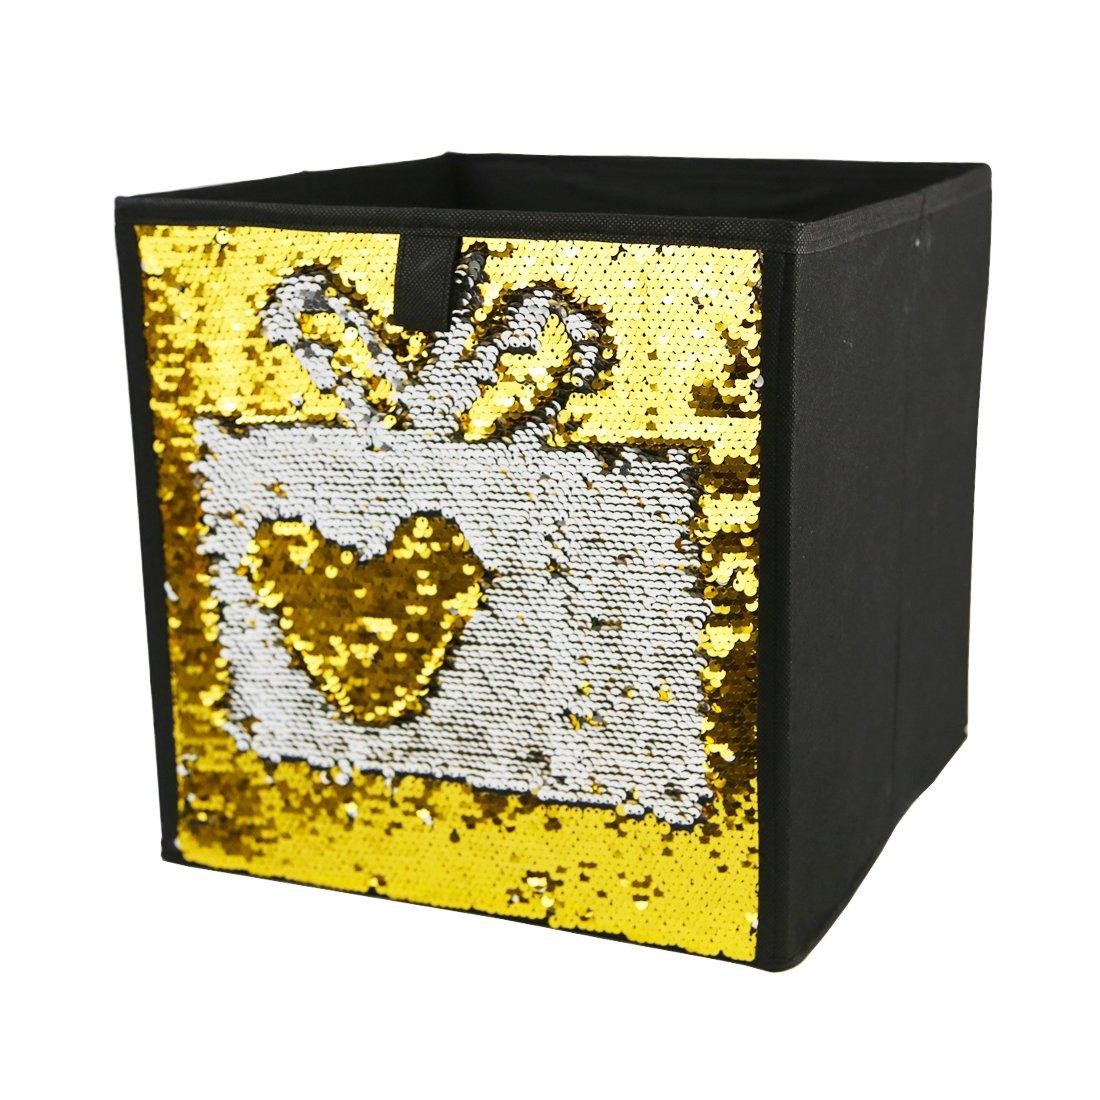 Two Tone Sequins Storage Bins Fabric Foldable Cube Organizer Drawer, 12X12X12 (Blue-sliver) LIFEAGE